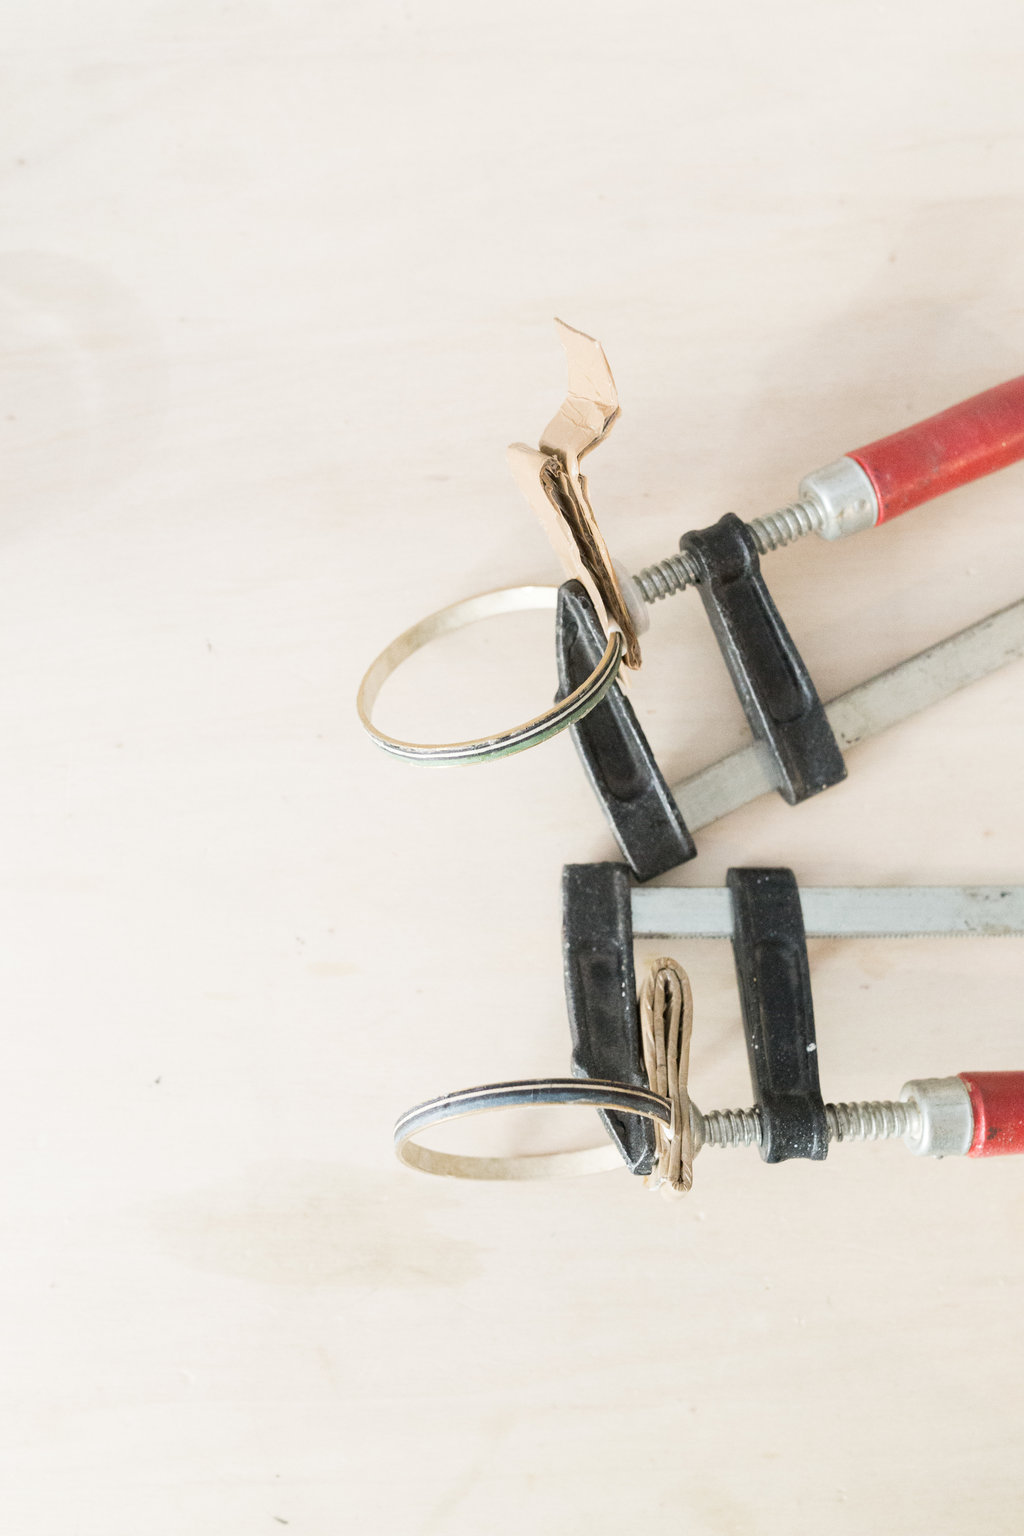 bijoux-fabrication-atelier-france.jpg